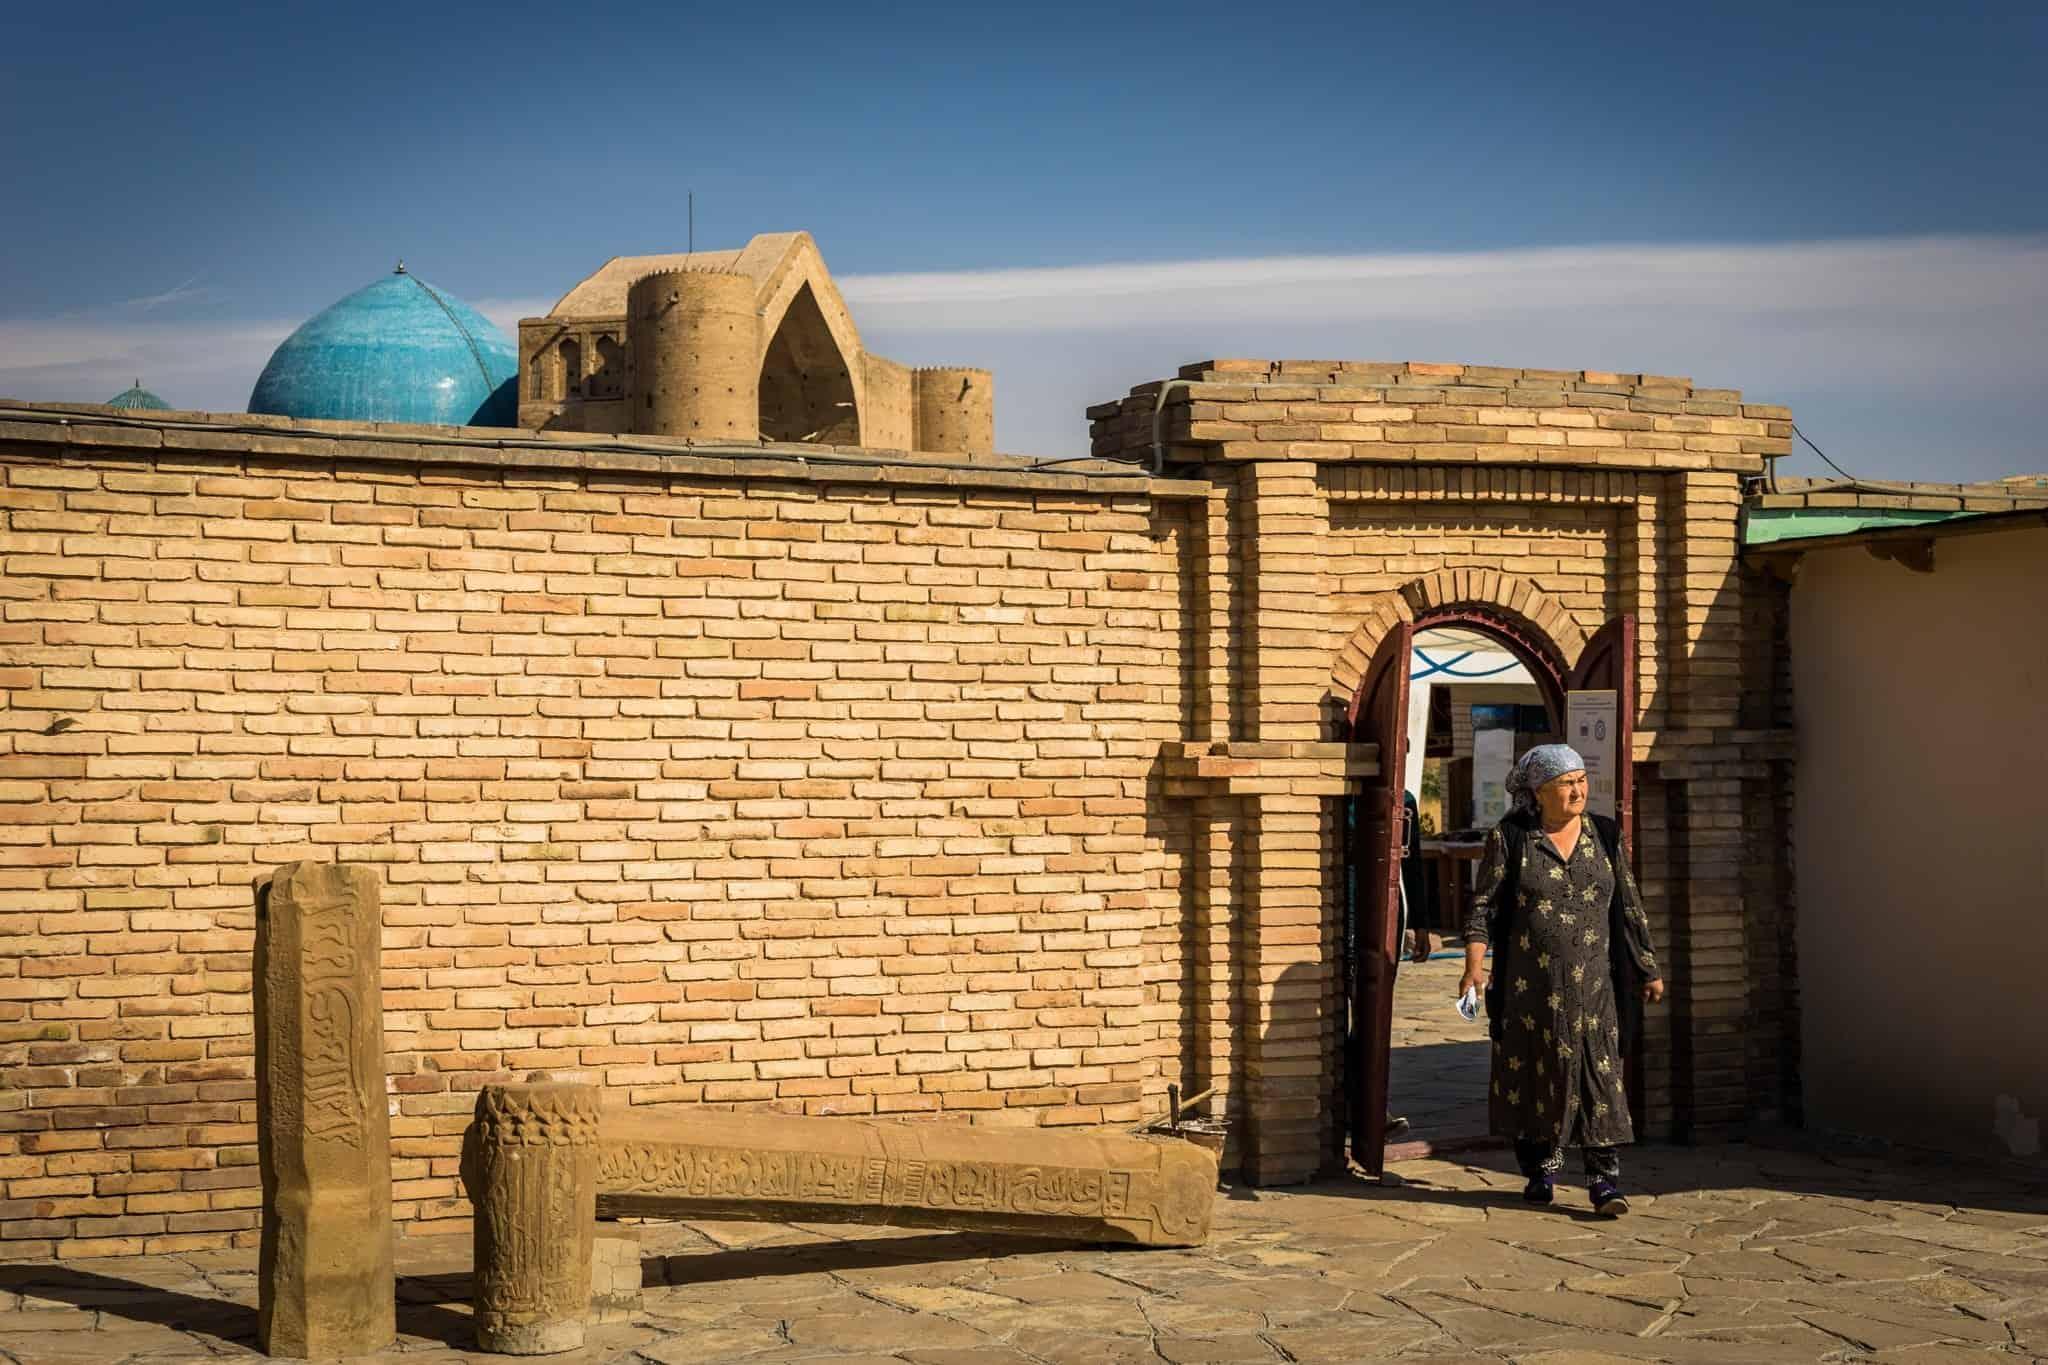 the Mausoleum of Khawaja Ahmed Yasawi